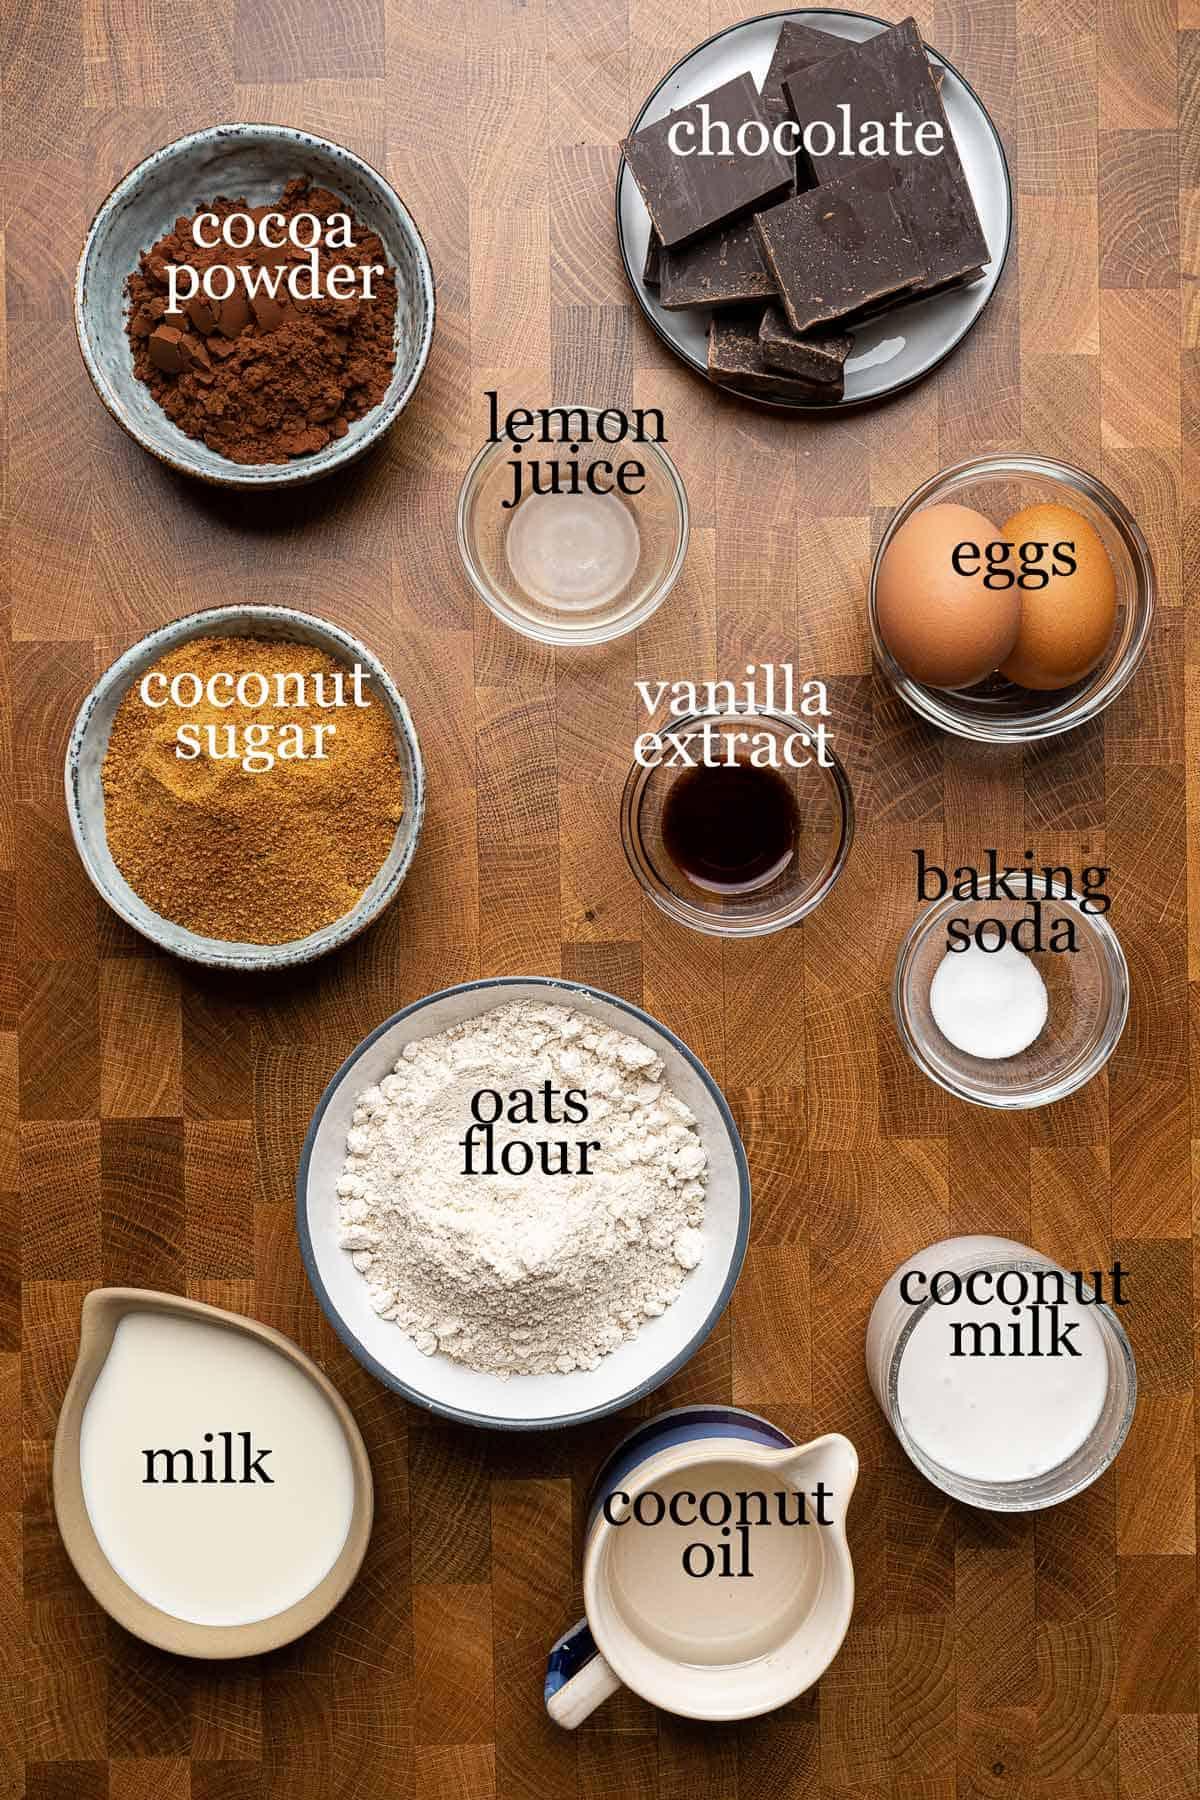 Ingredients to make healthy chocolate sheet cake